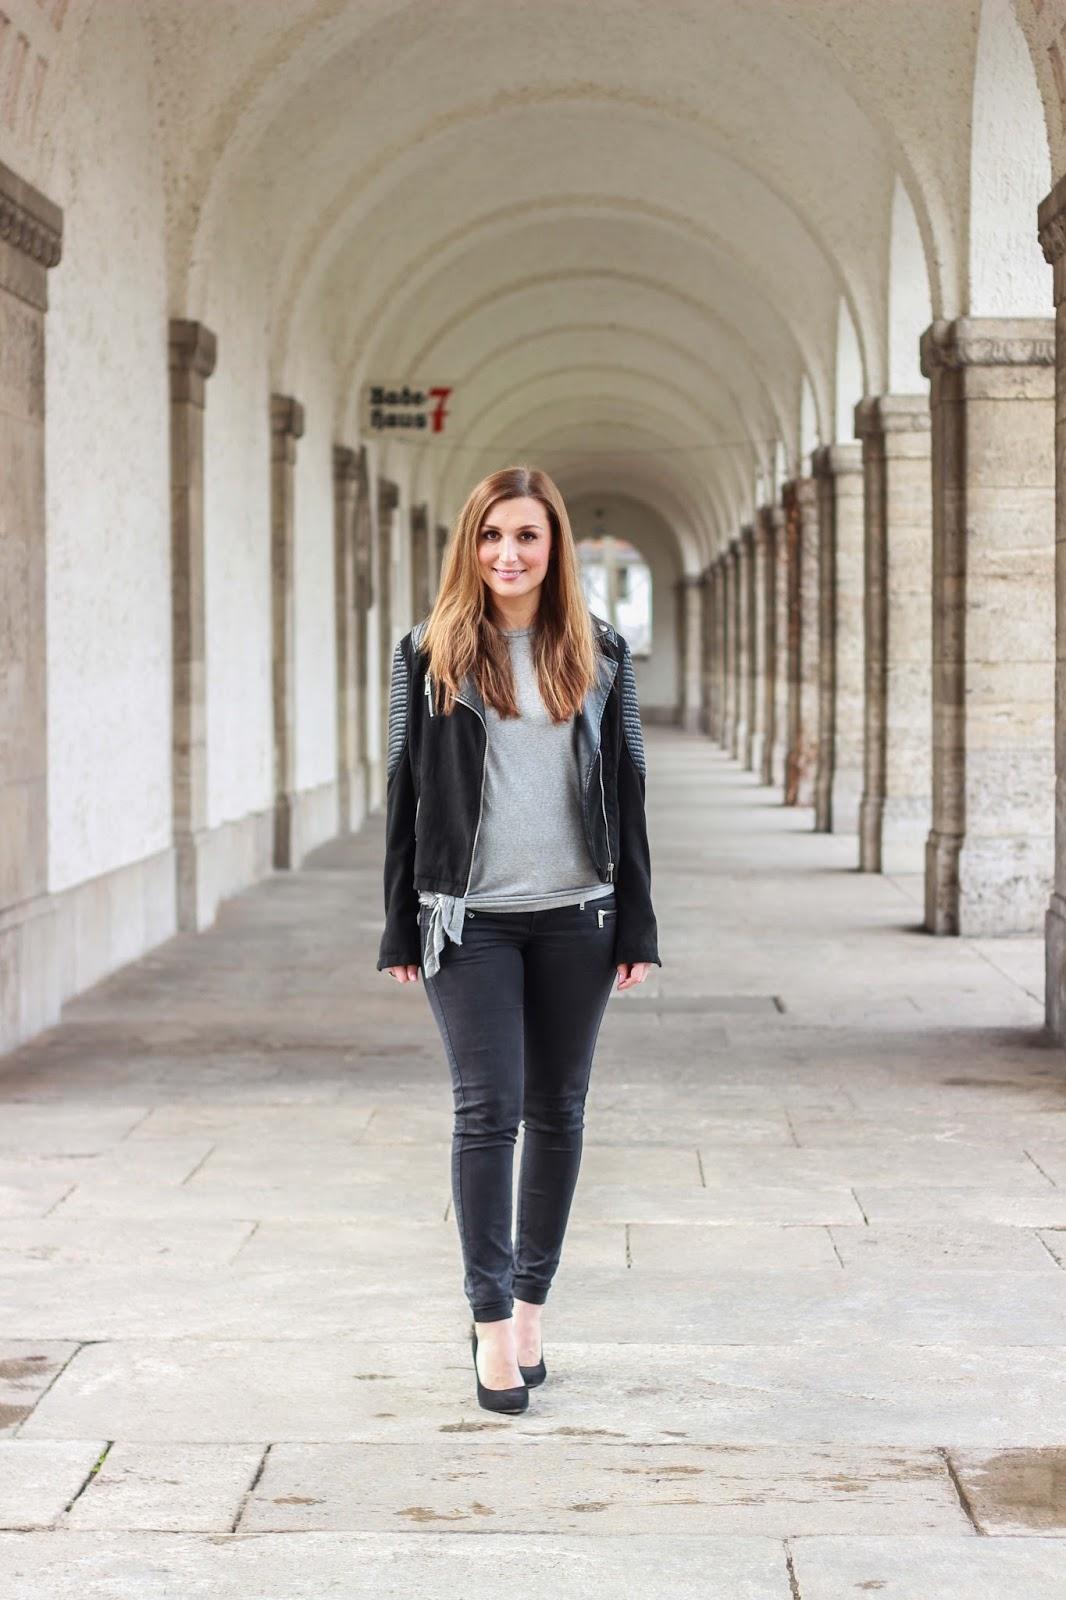 Frankfurter fashionblogger - german fashionblogger - fashionblogger aus frankfurt - graues t shirt kombinieren -